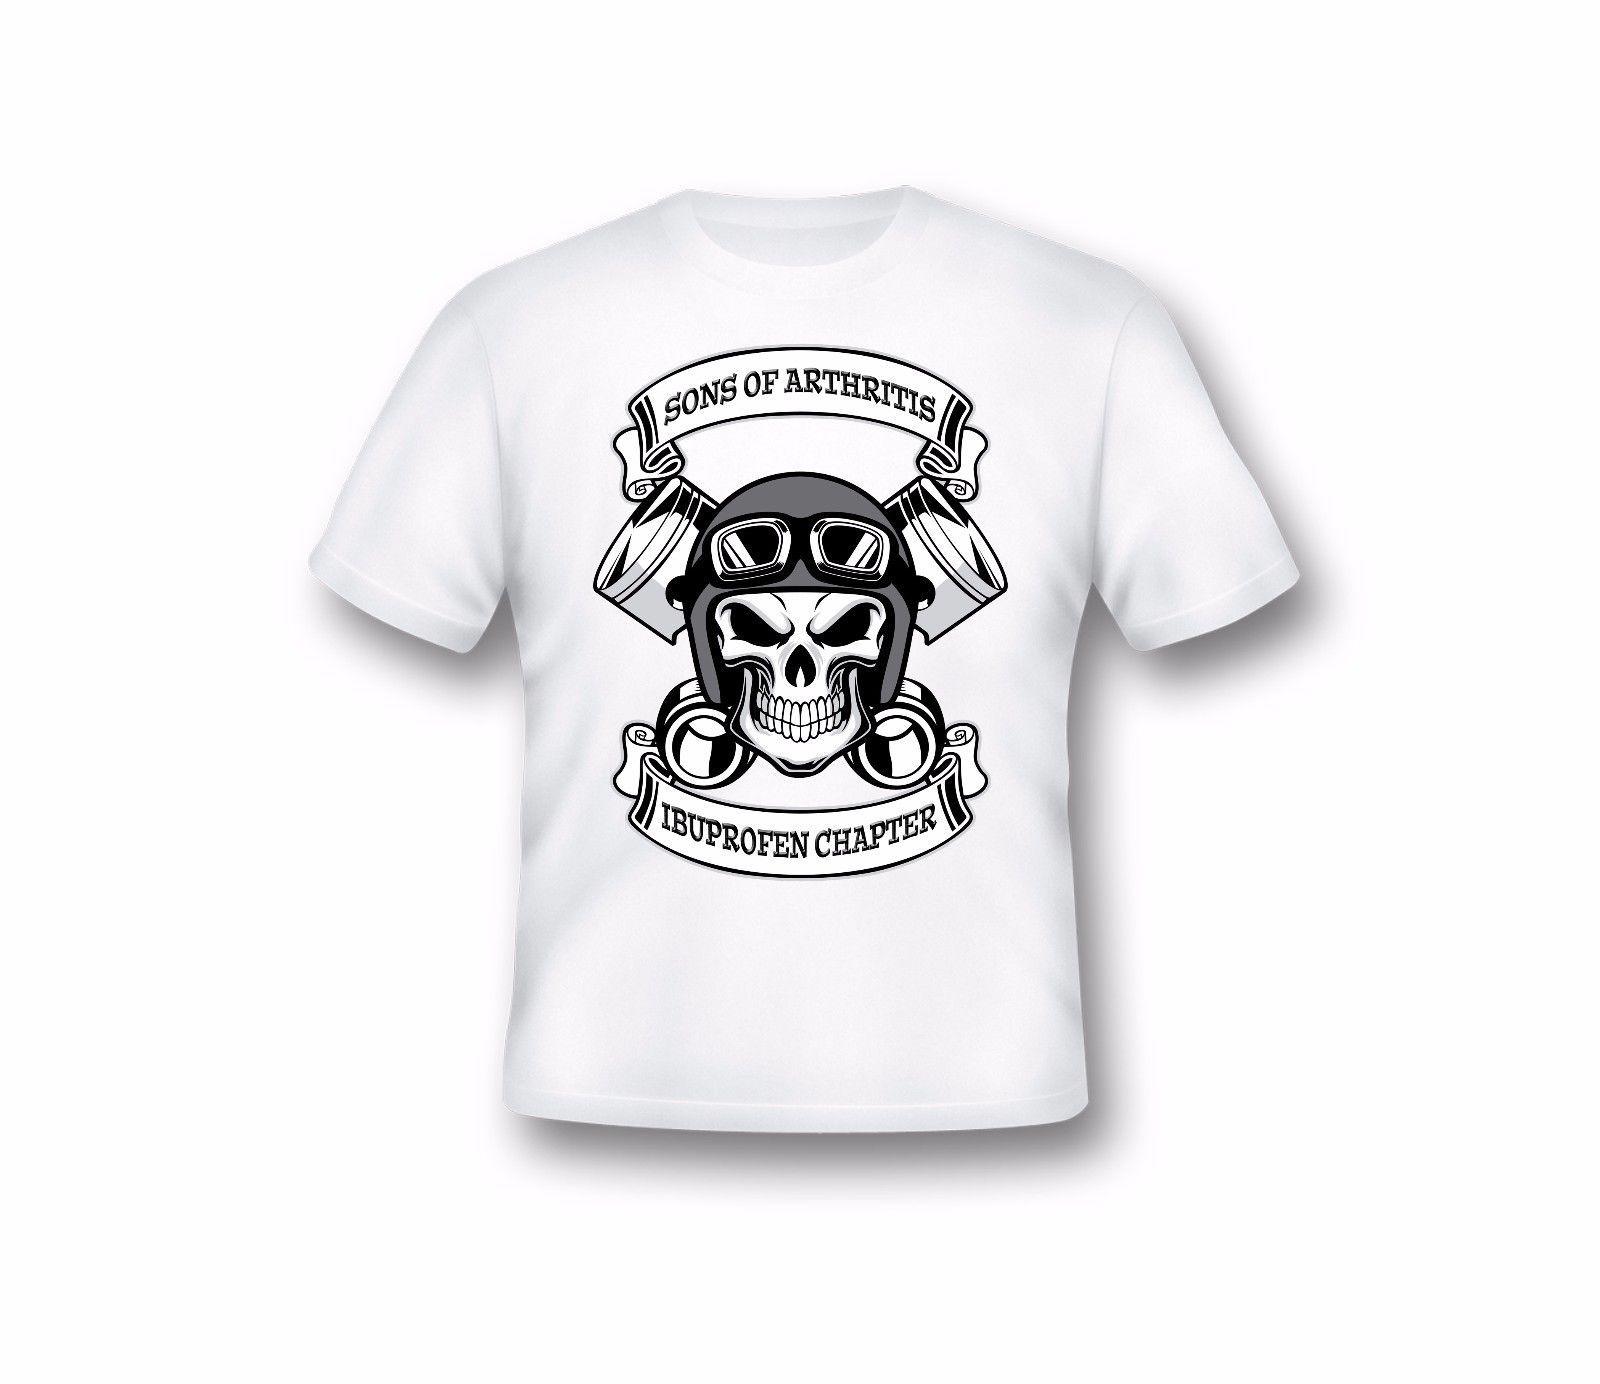 9d7d2797 Sons Of Arthritis Wholesale Discount Chapter T Shirt , Men'S , Biker T Shirt  Sayings , 46 Shirts Homme Novelty T Shirts Men Cool Funny T Shirts On T  Shirt ...